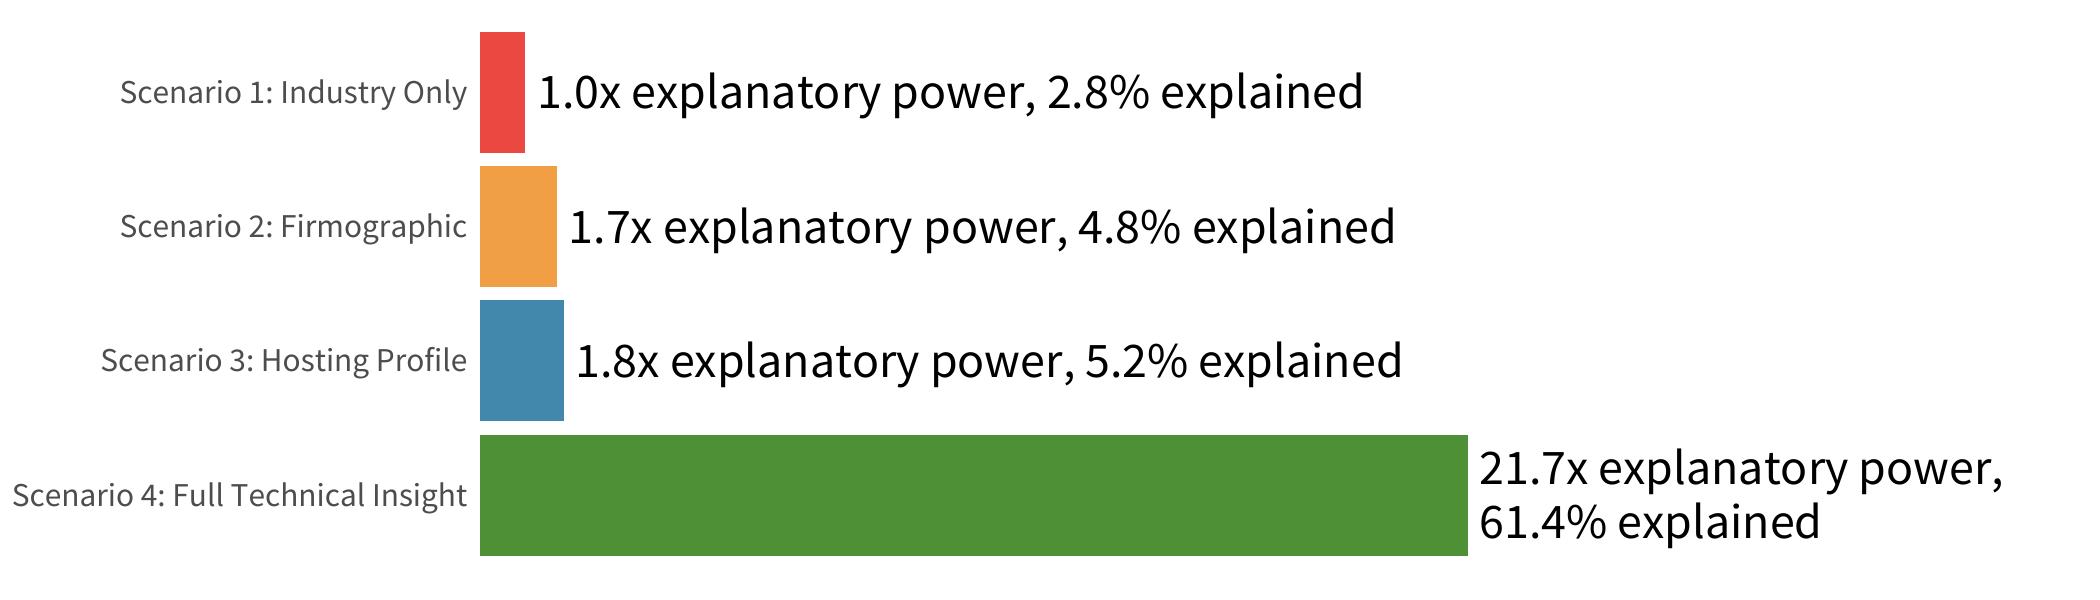 Explanatory power of full technical data